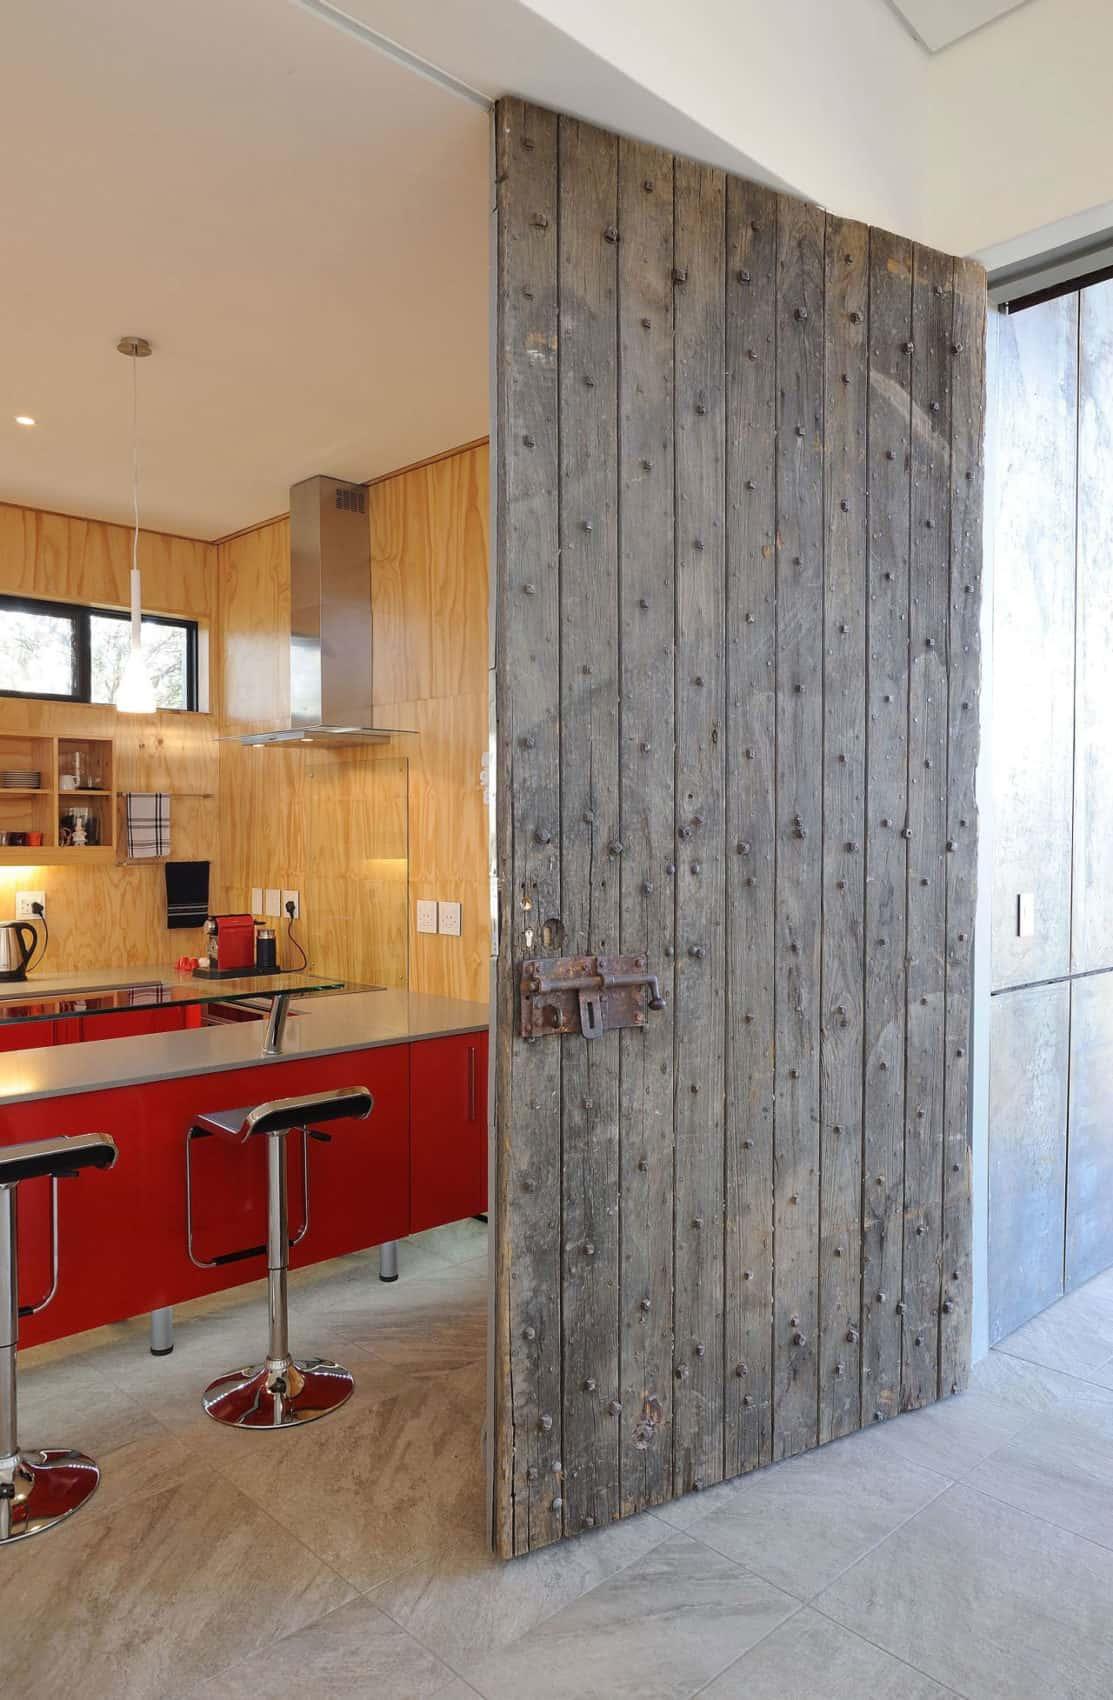 10 Ossmann Street by Wasserfall Munting Architects (7)